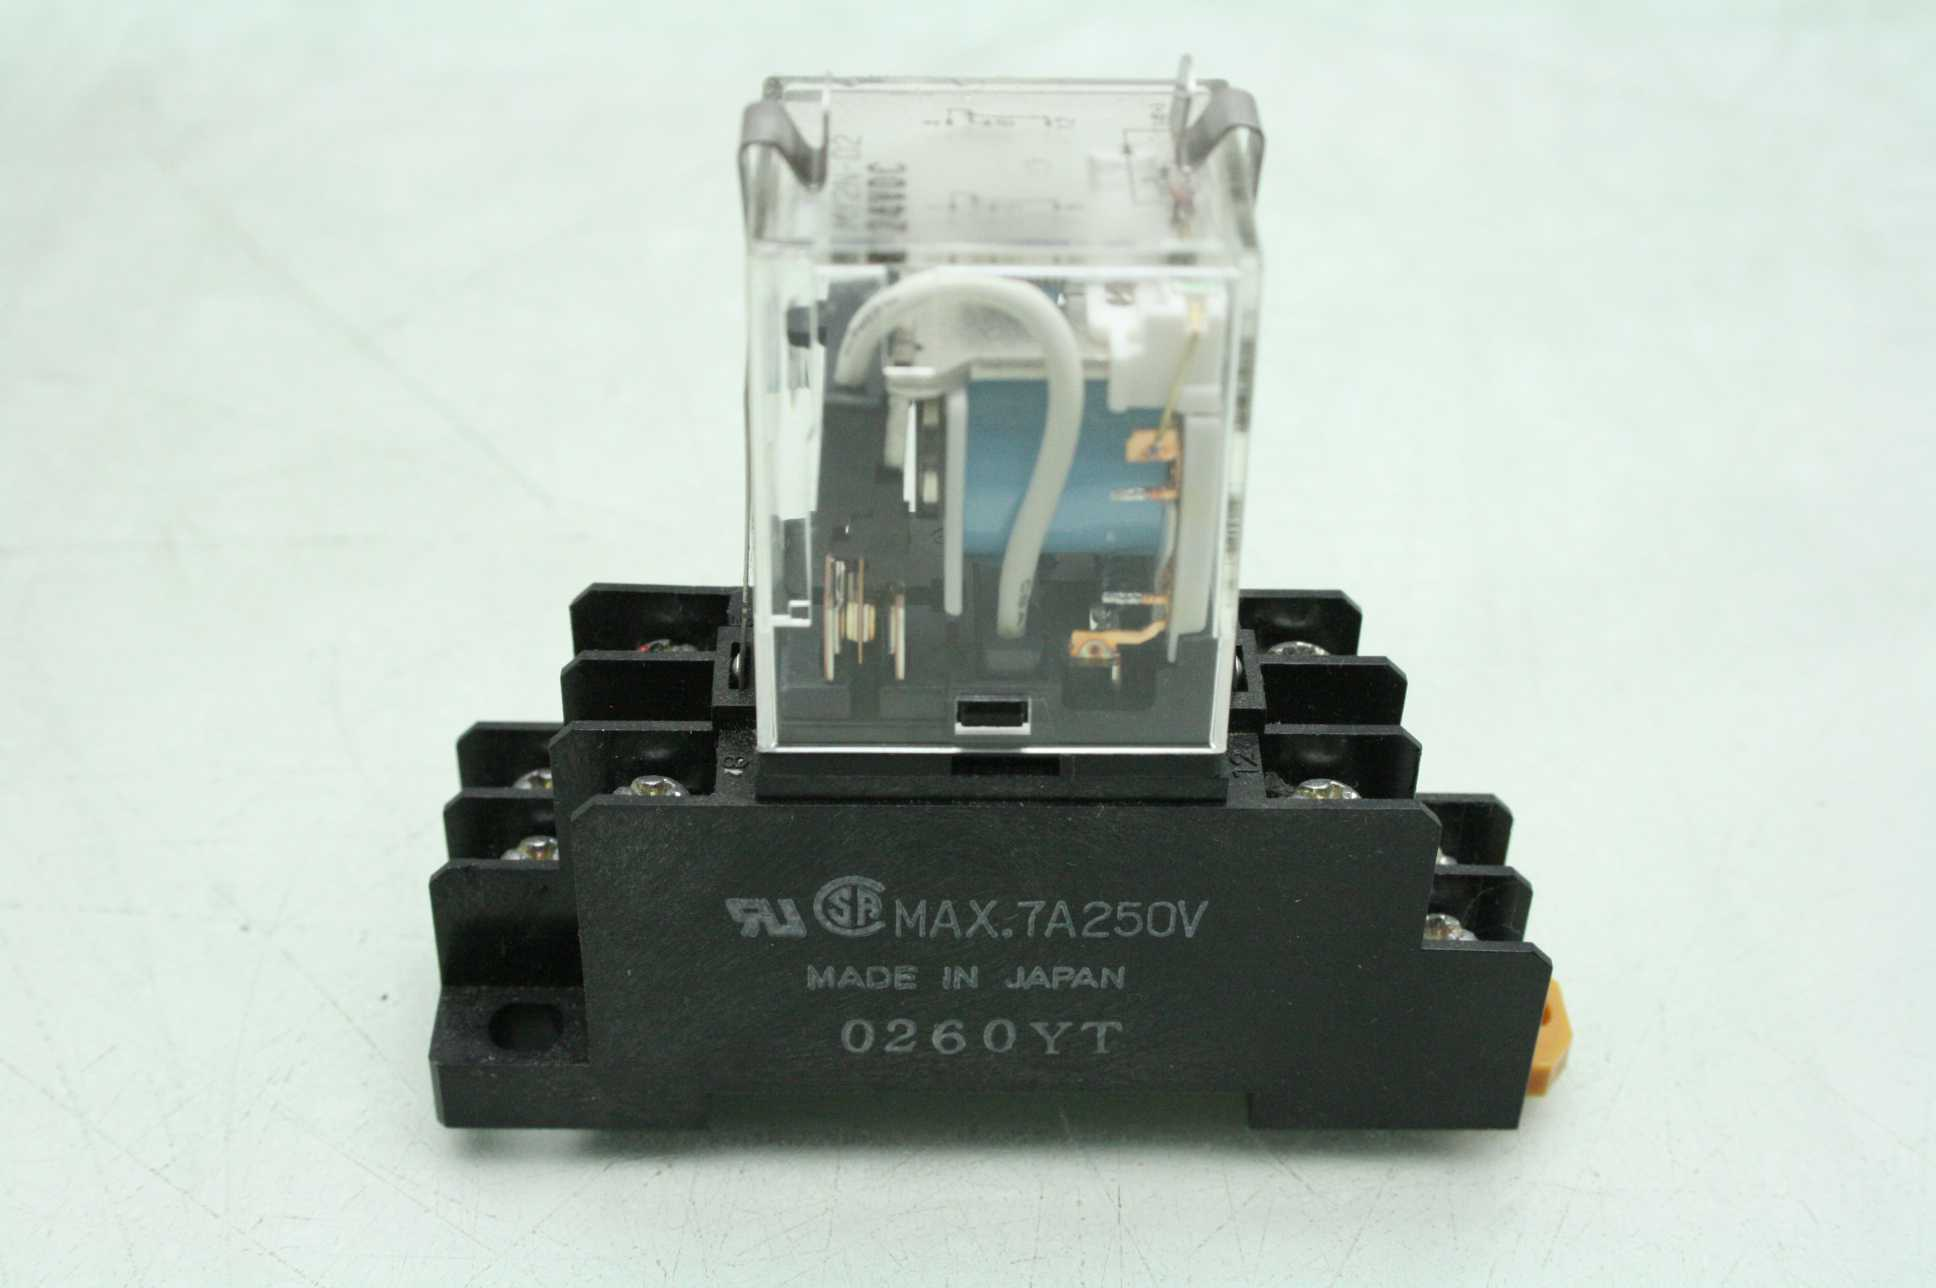 omron my2n relay wiring diagram model t 7 d2 24vdc w amp base used motion